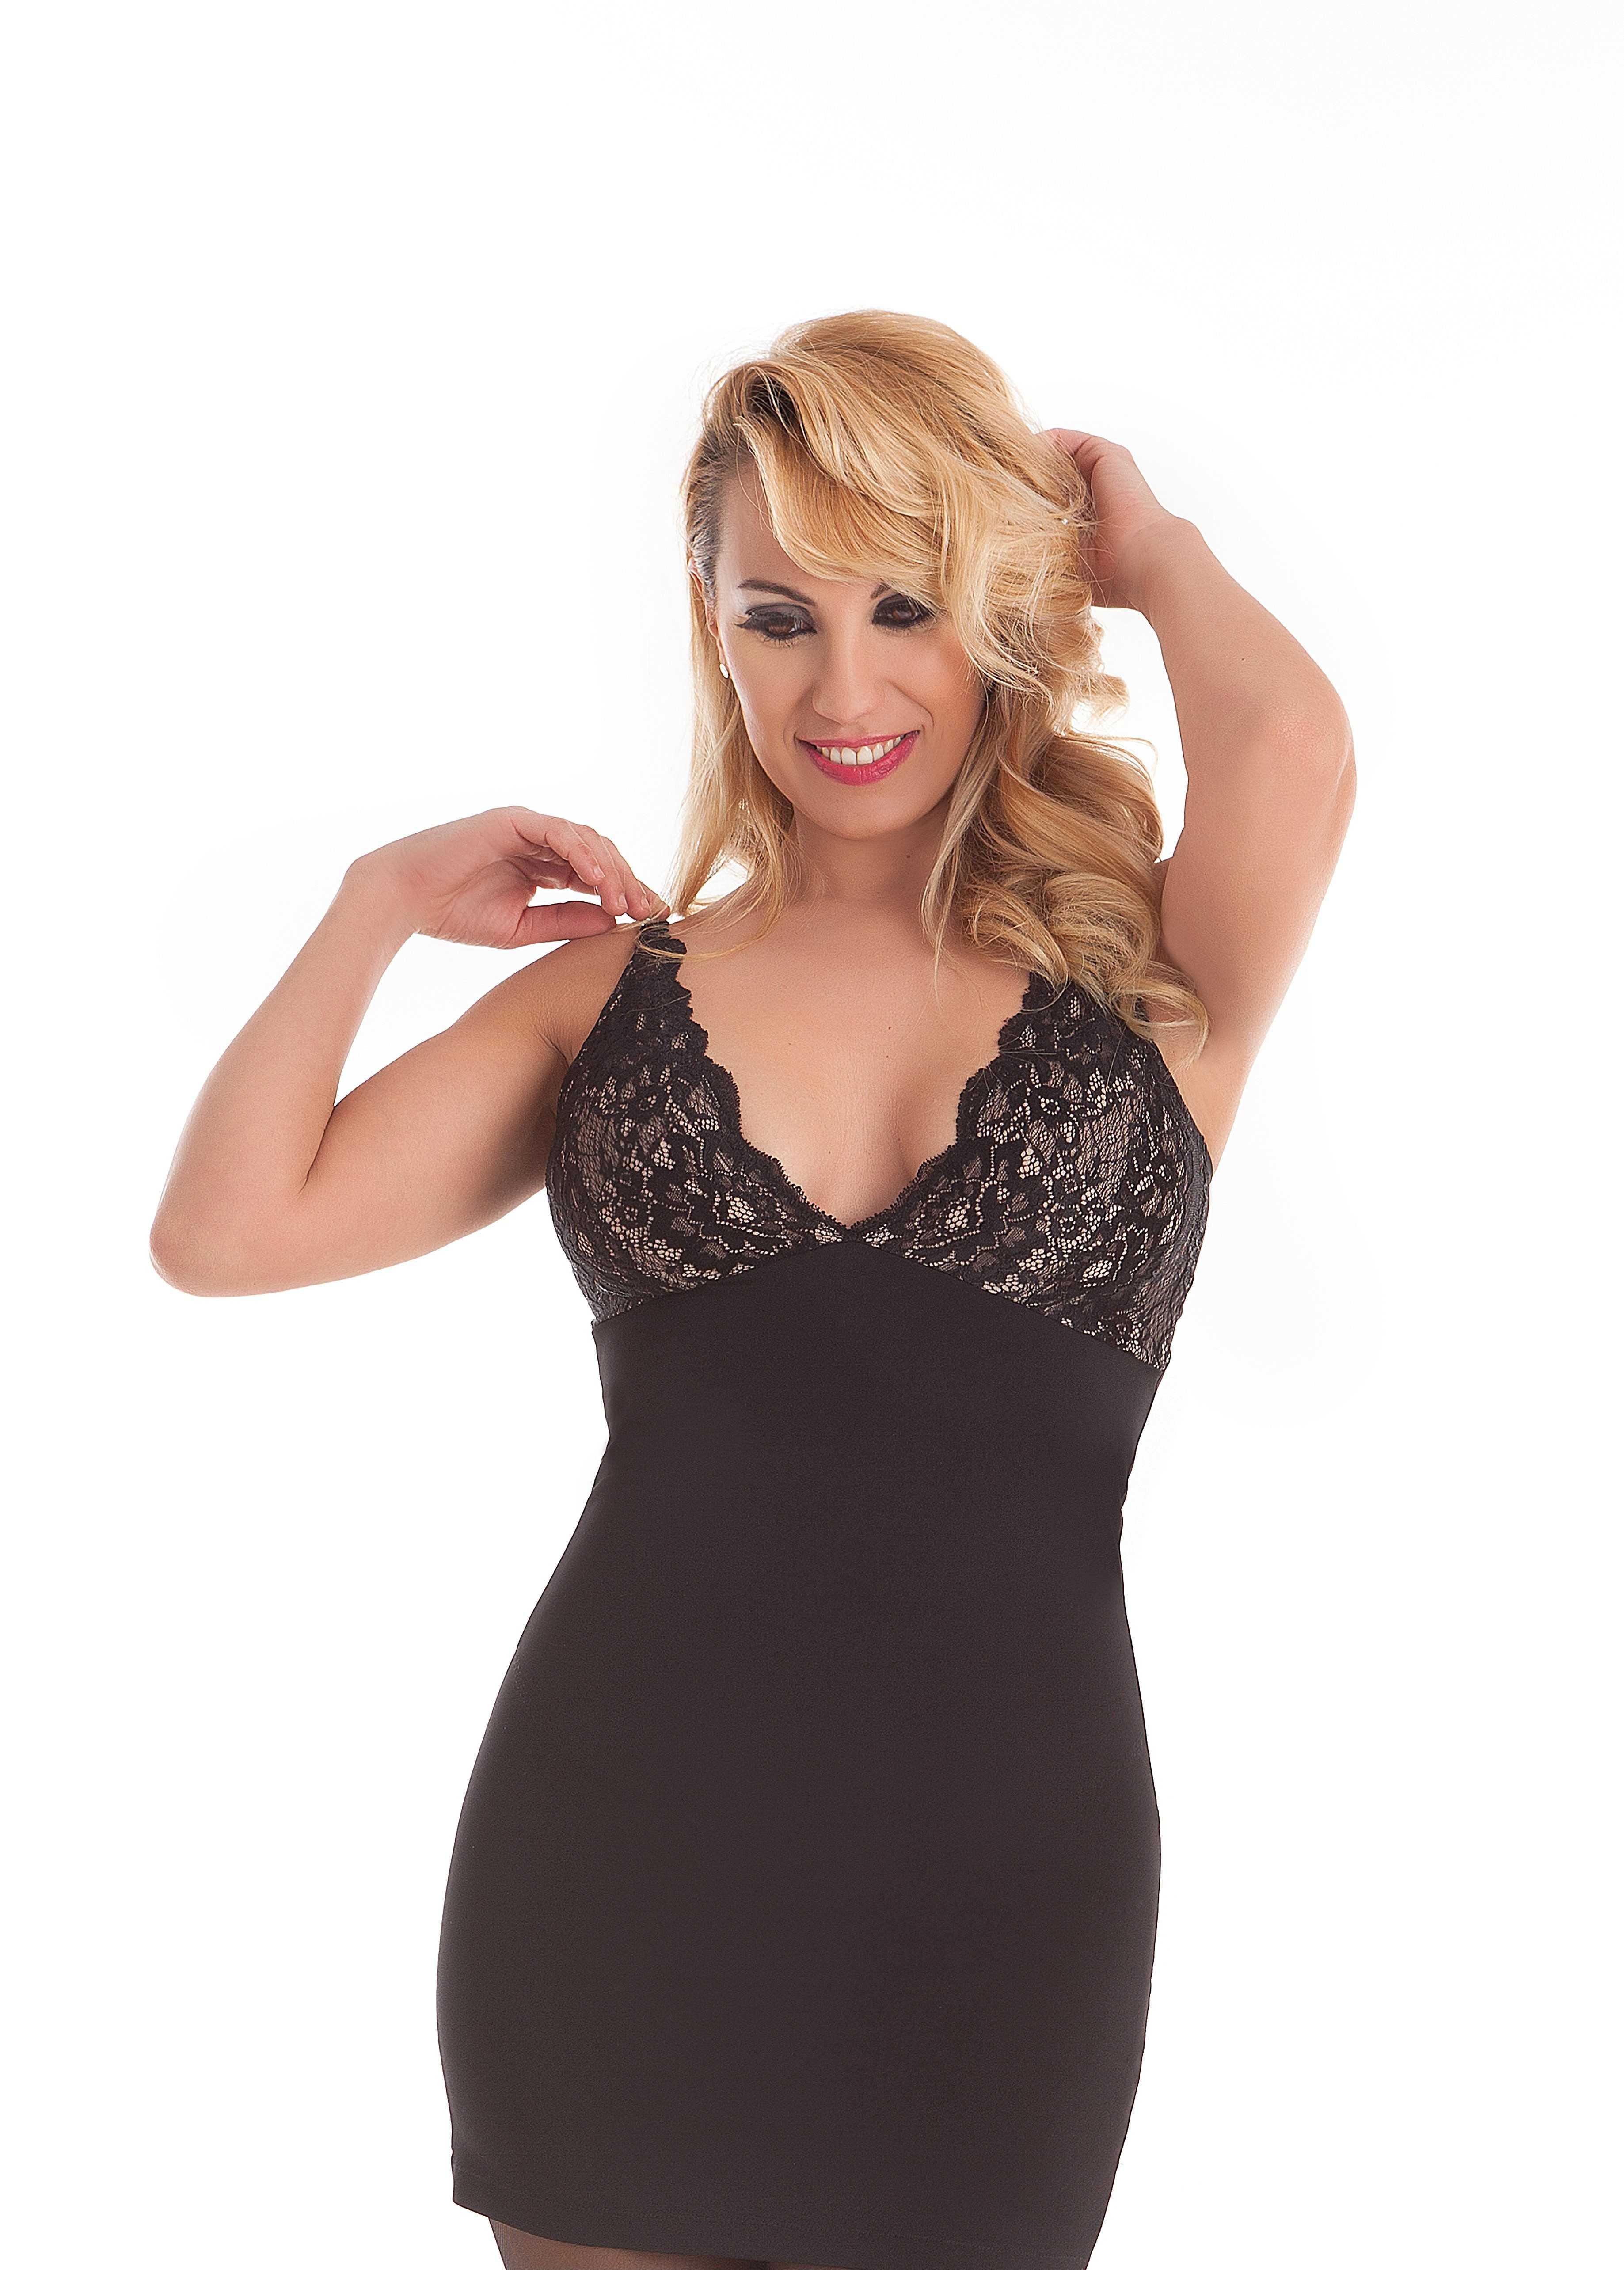 Vestido Moldeador encaje elástico Beauty Mariola TALLAS: m, l, xl, xxl; COLOR: negro, camel  - LENCERIA  - PEPI GUERRA